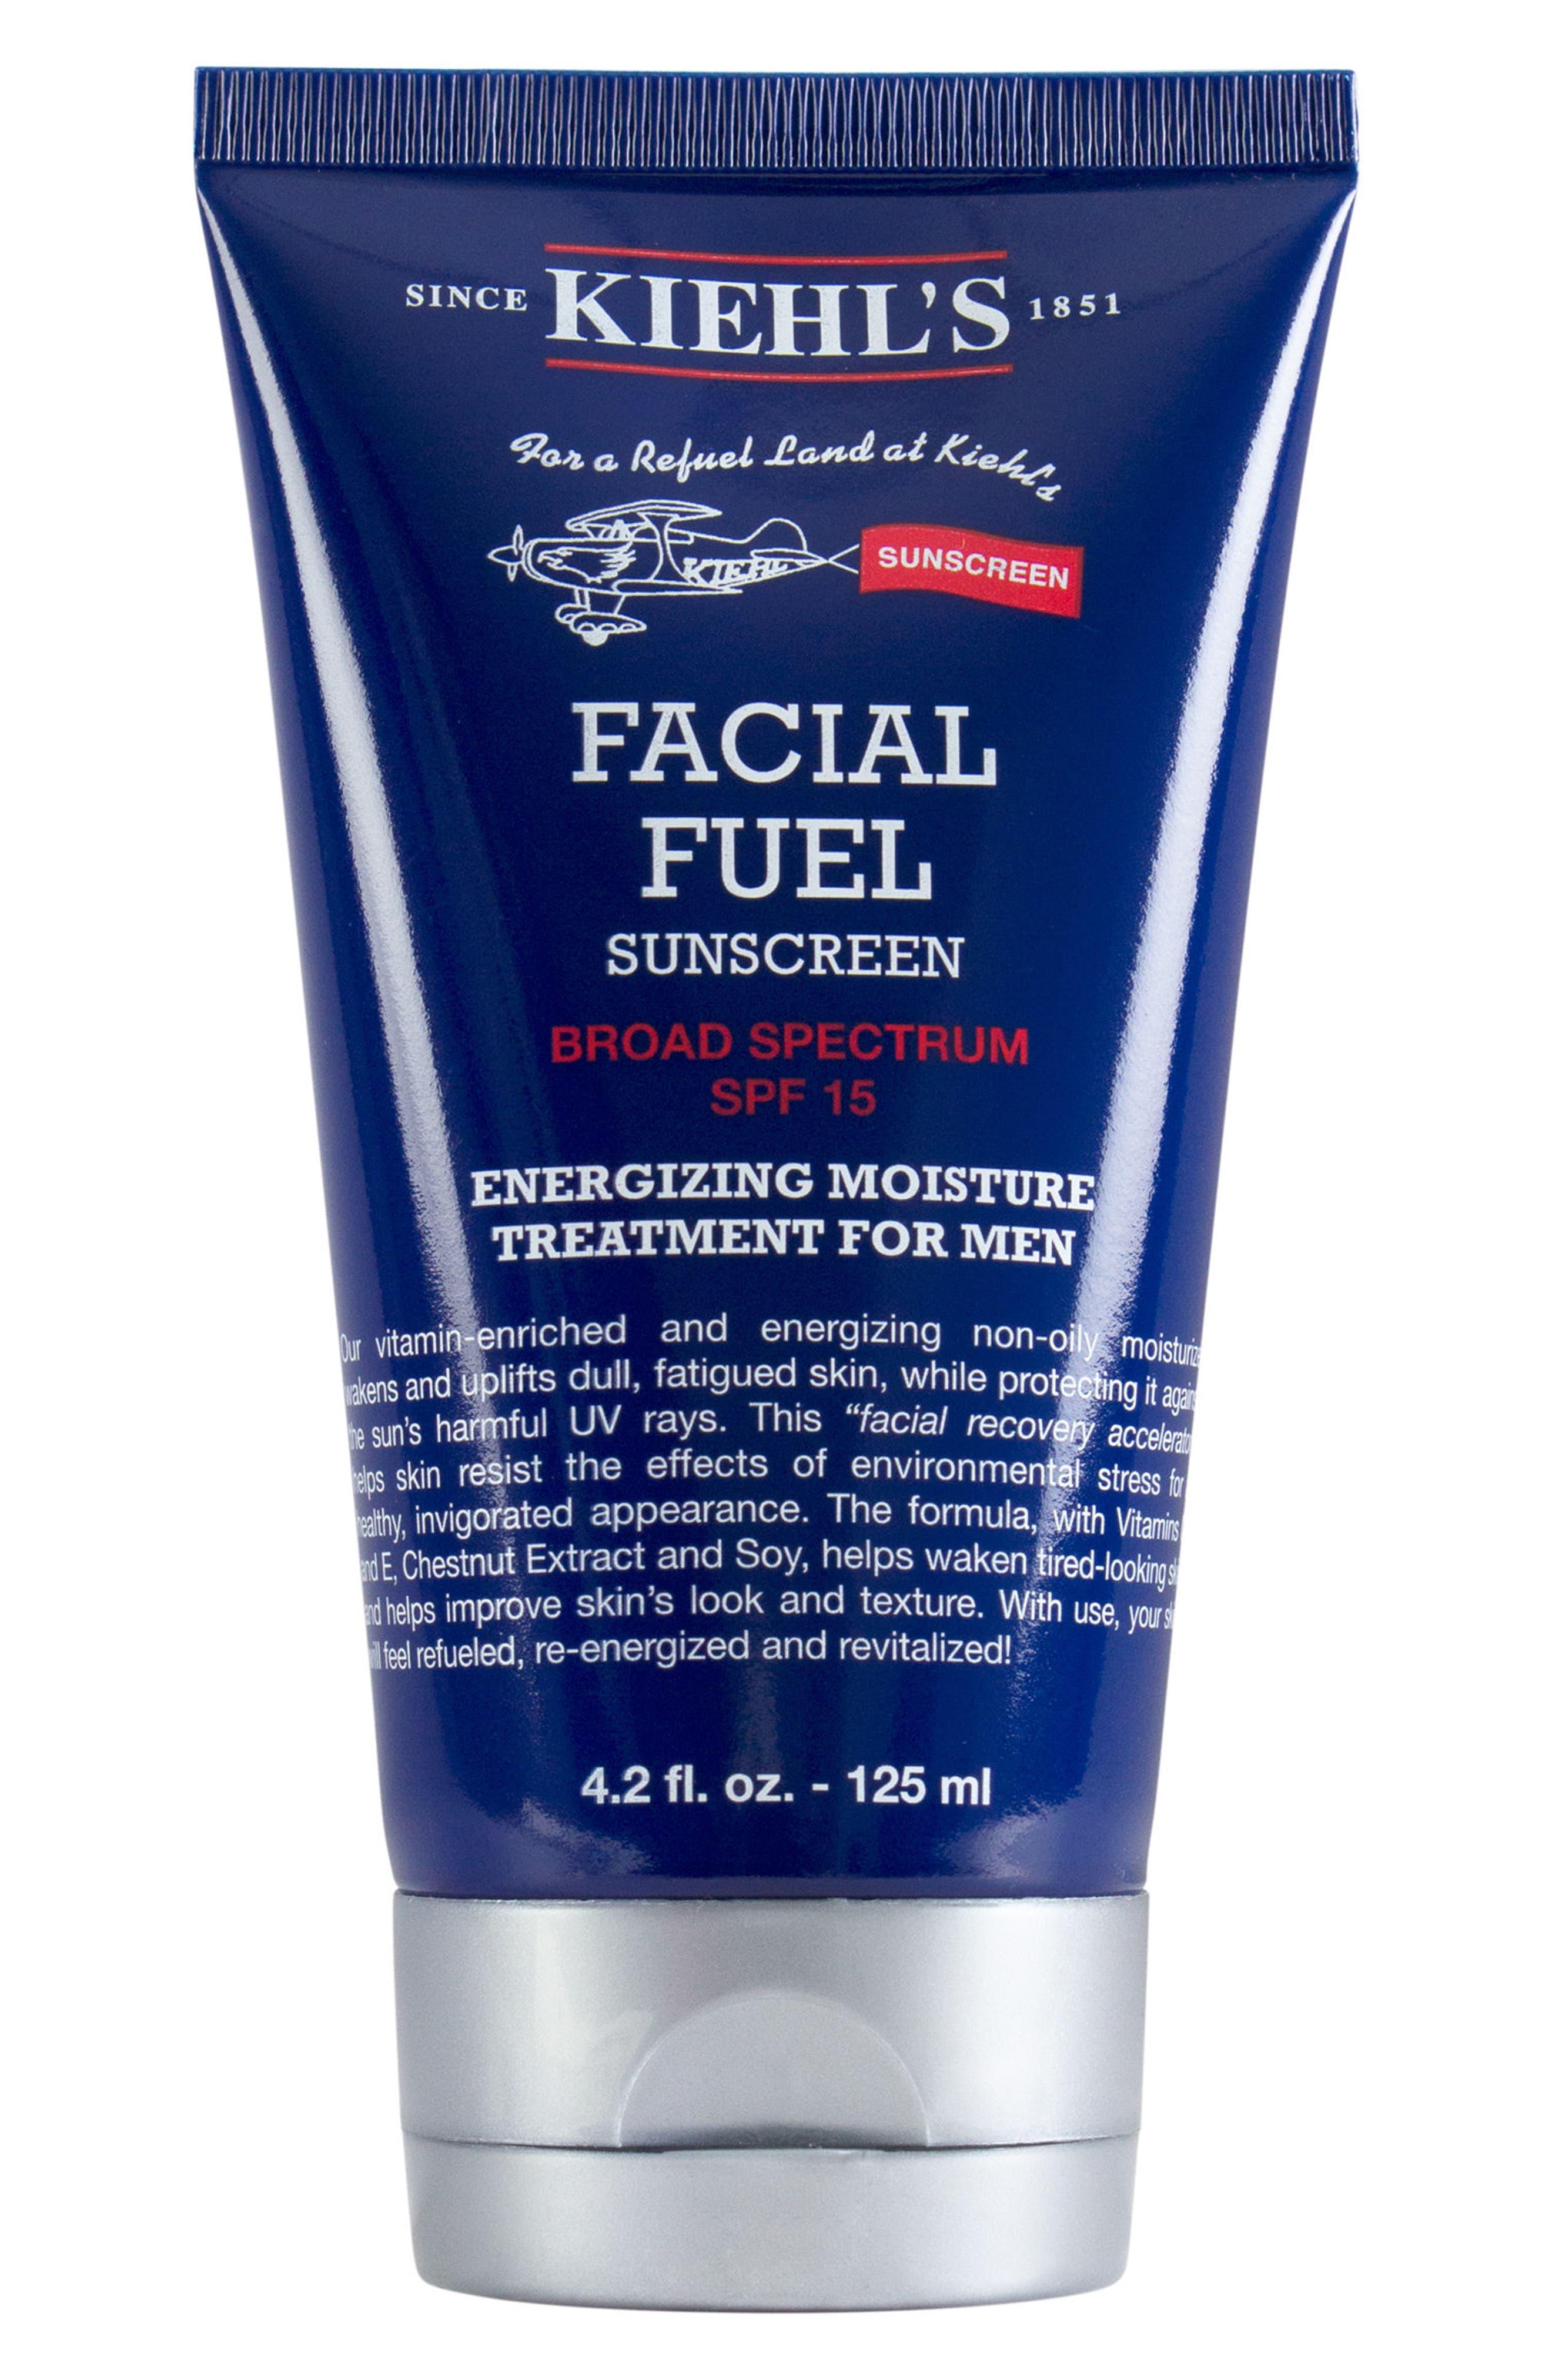 KIEHL'S SINCE 1851 Facial Fuel Energizing Moisture Treatment for Men SPF 15, Main, color, 000